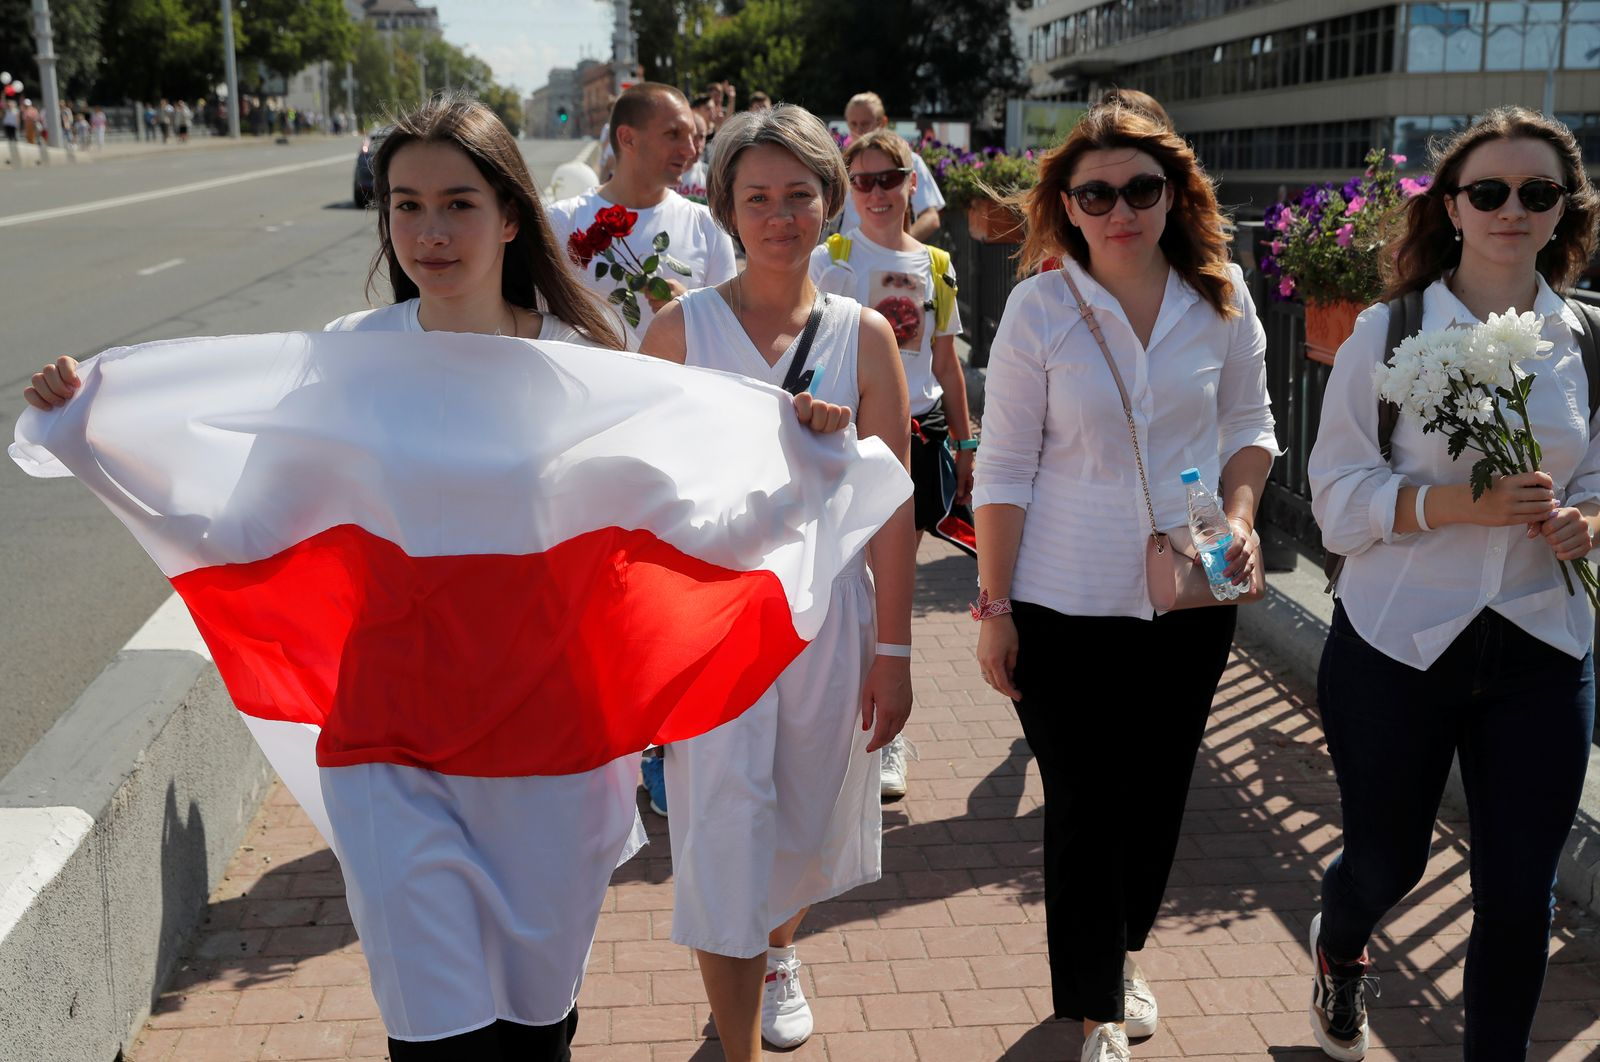 Demonstrators protest against presidential election results in Minsk